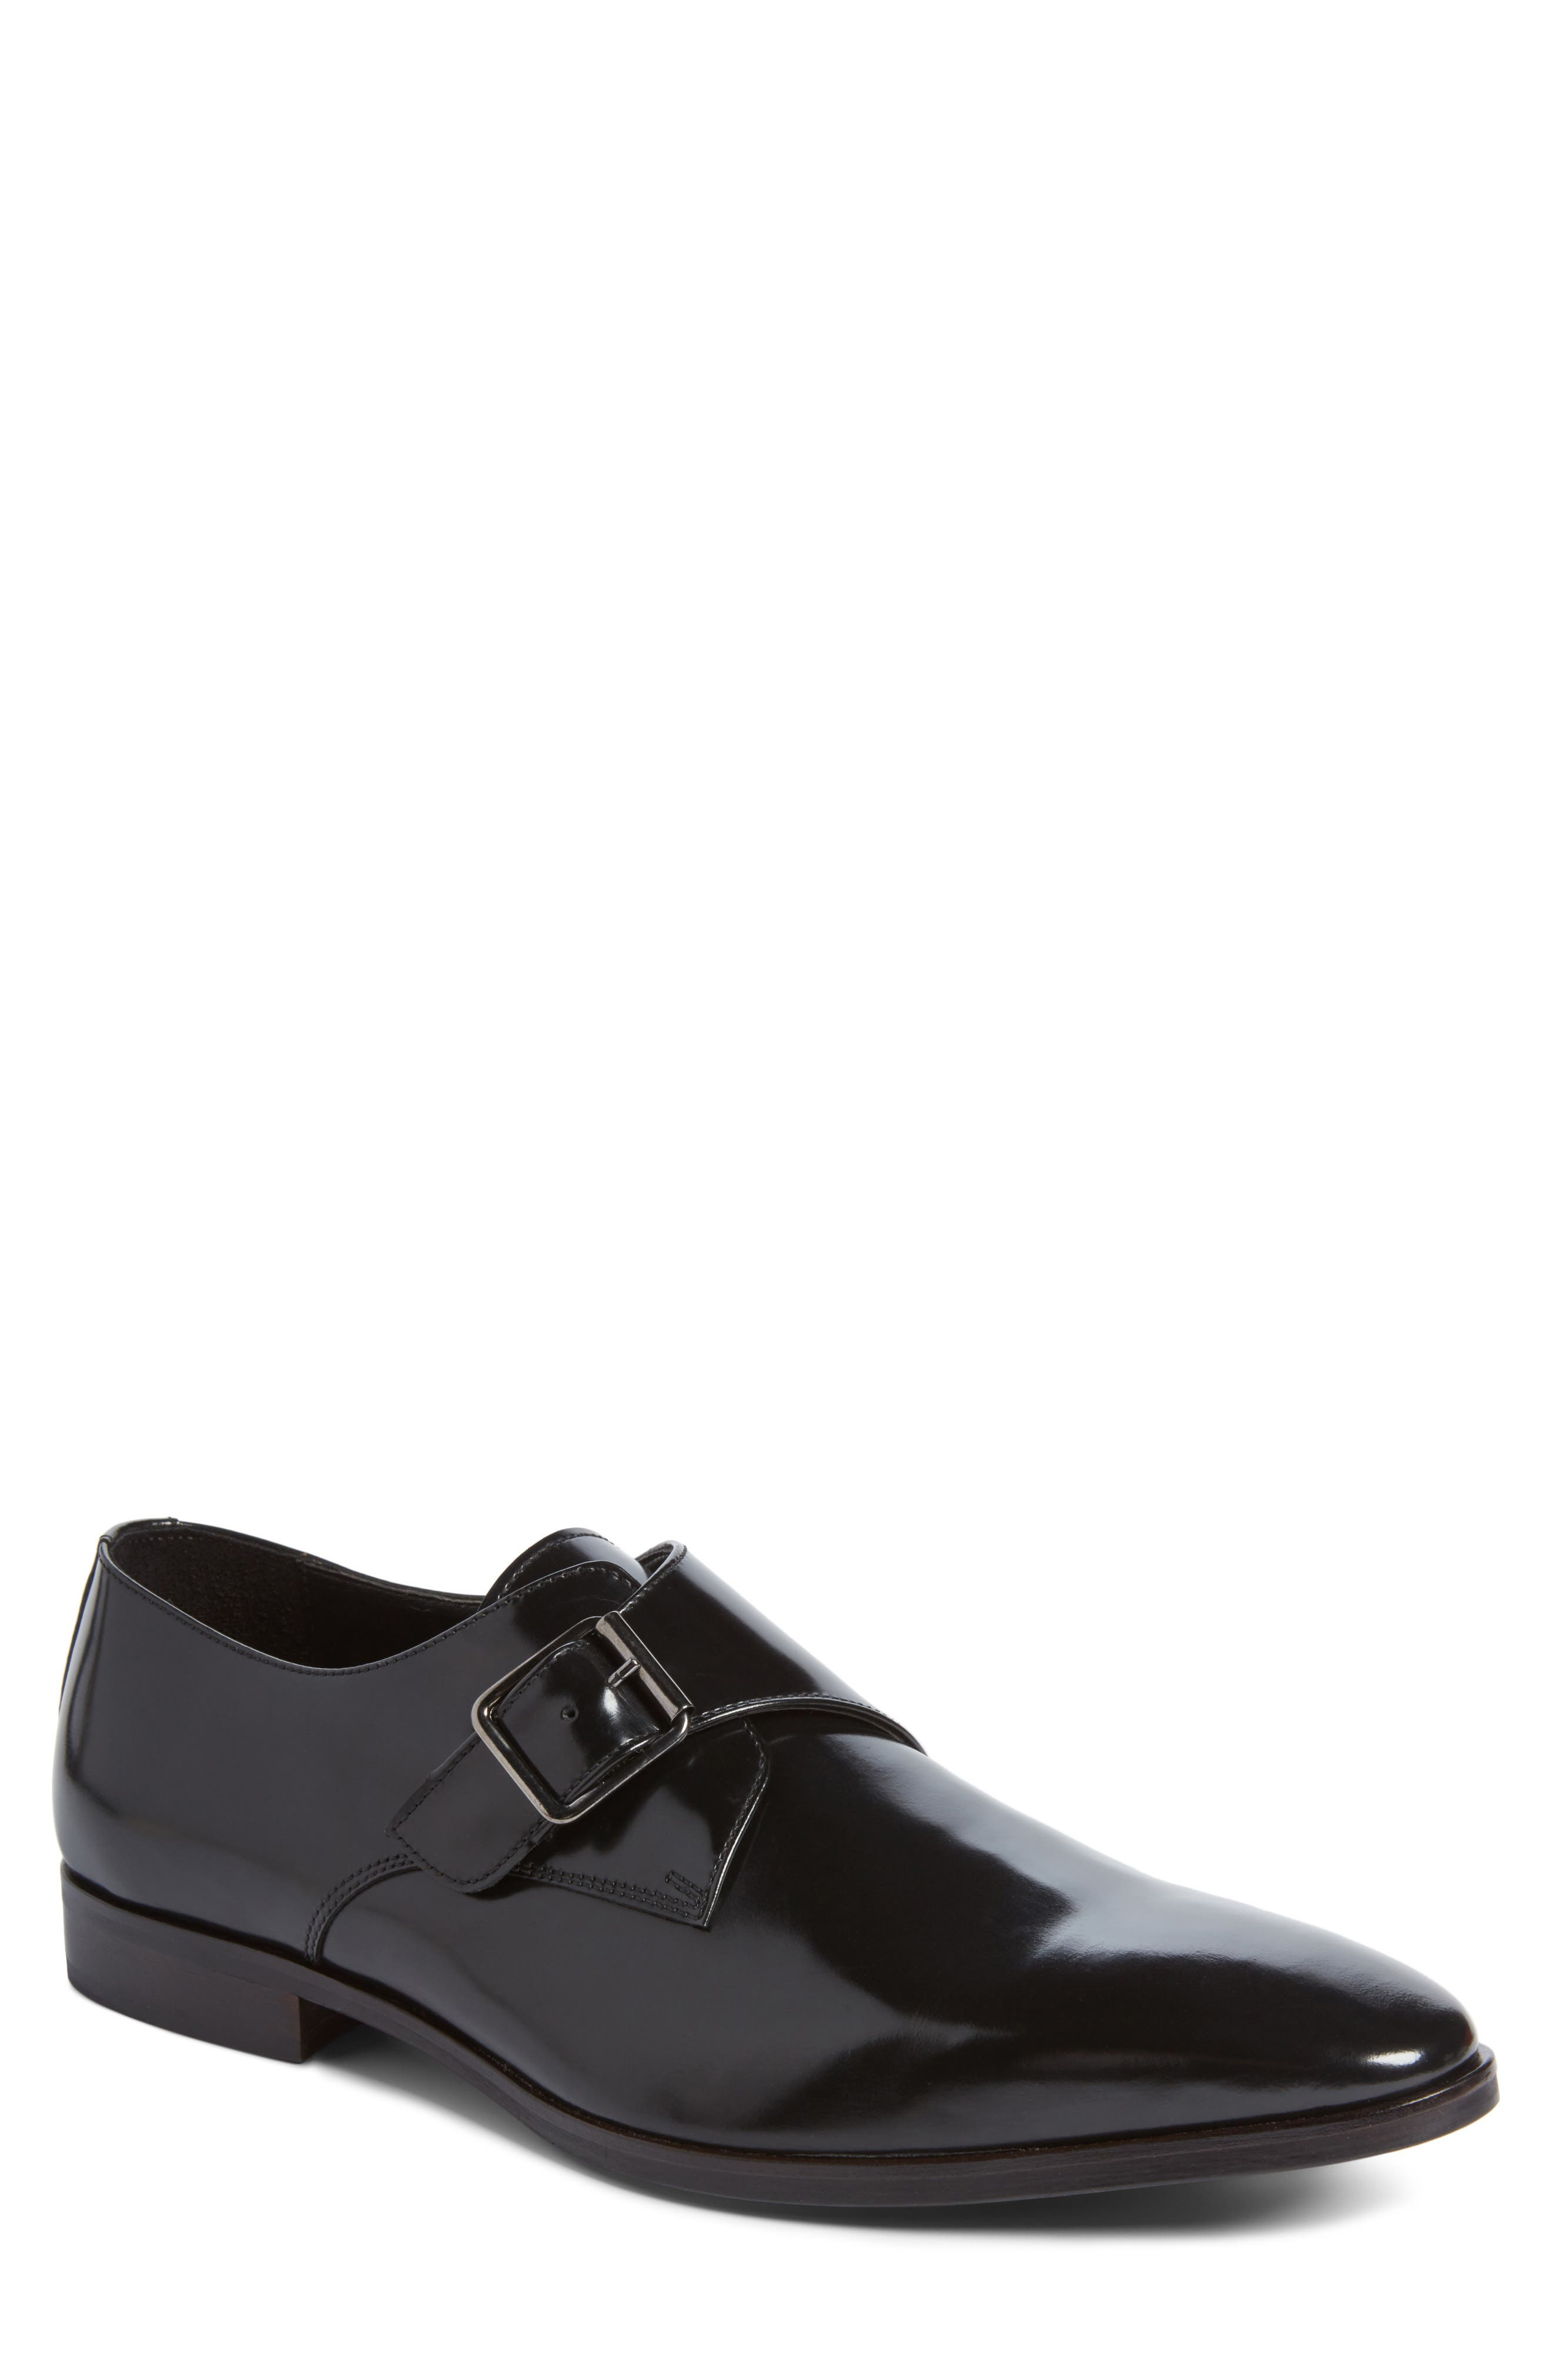 Main Image - The Rail Webster Single Strap Monk Shoe (Men)